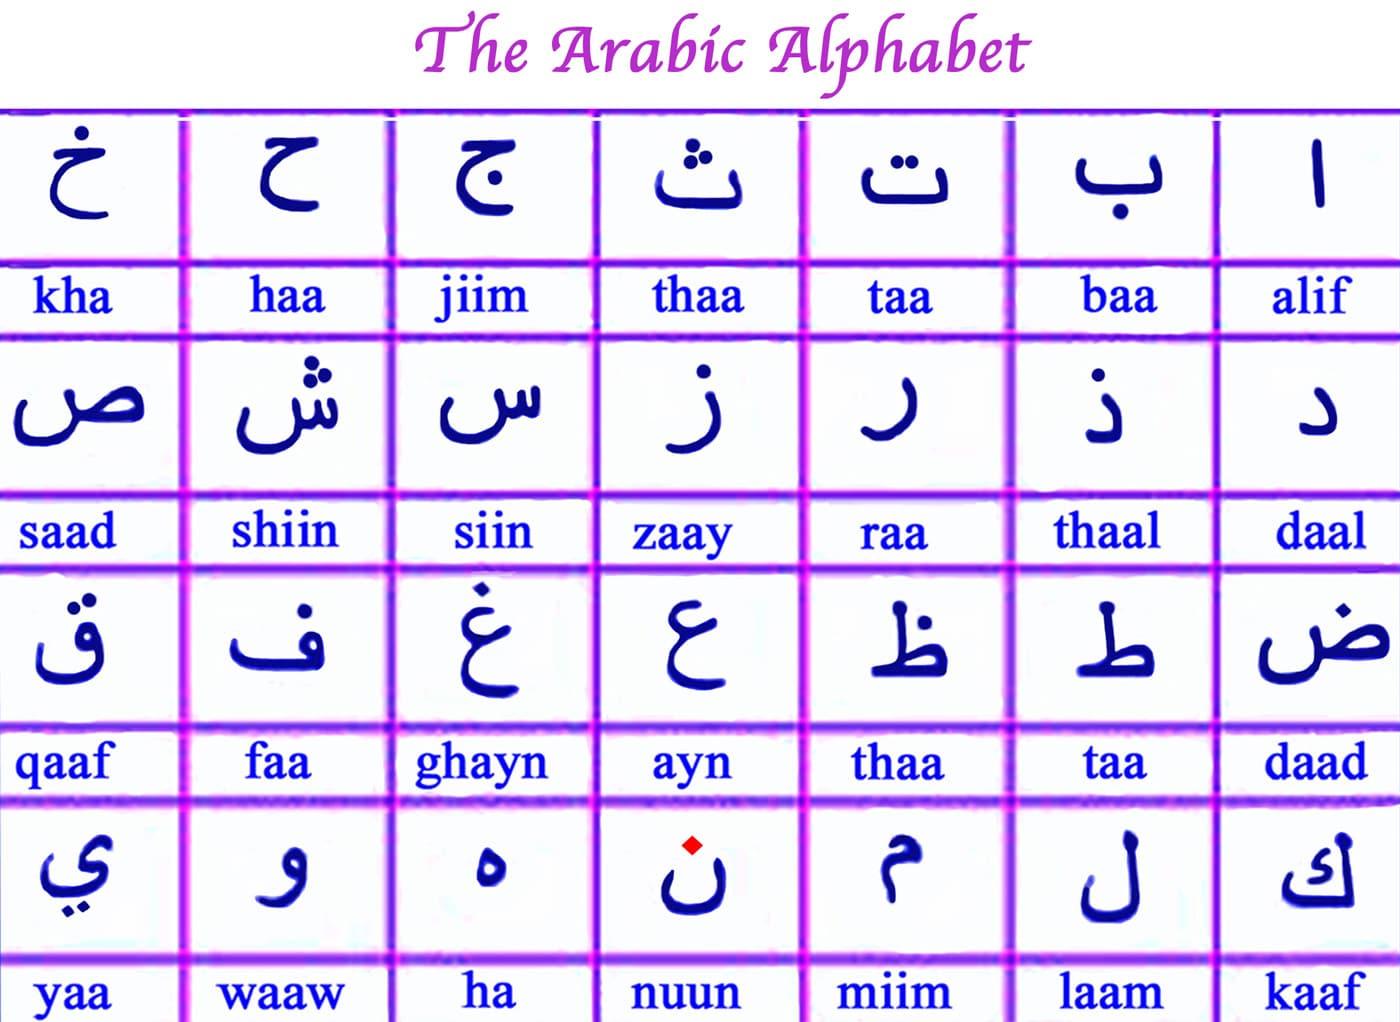 Arabic Alphabet Image